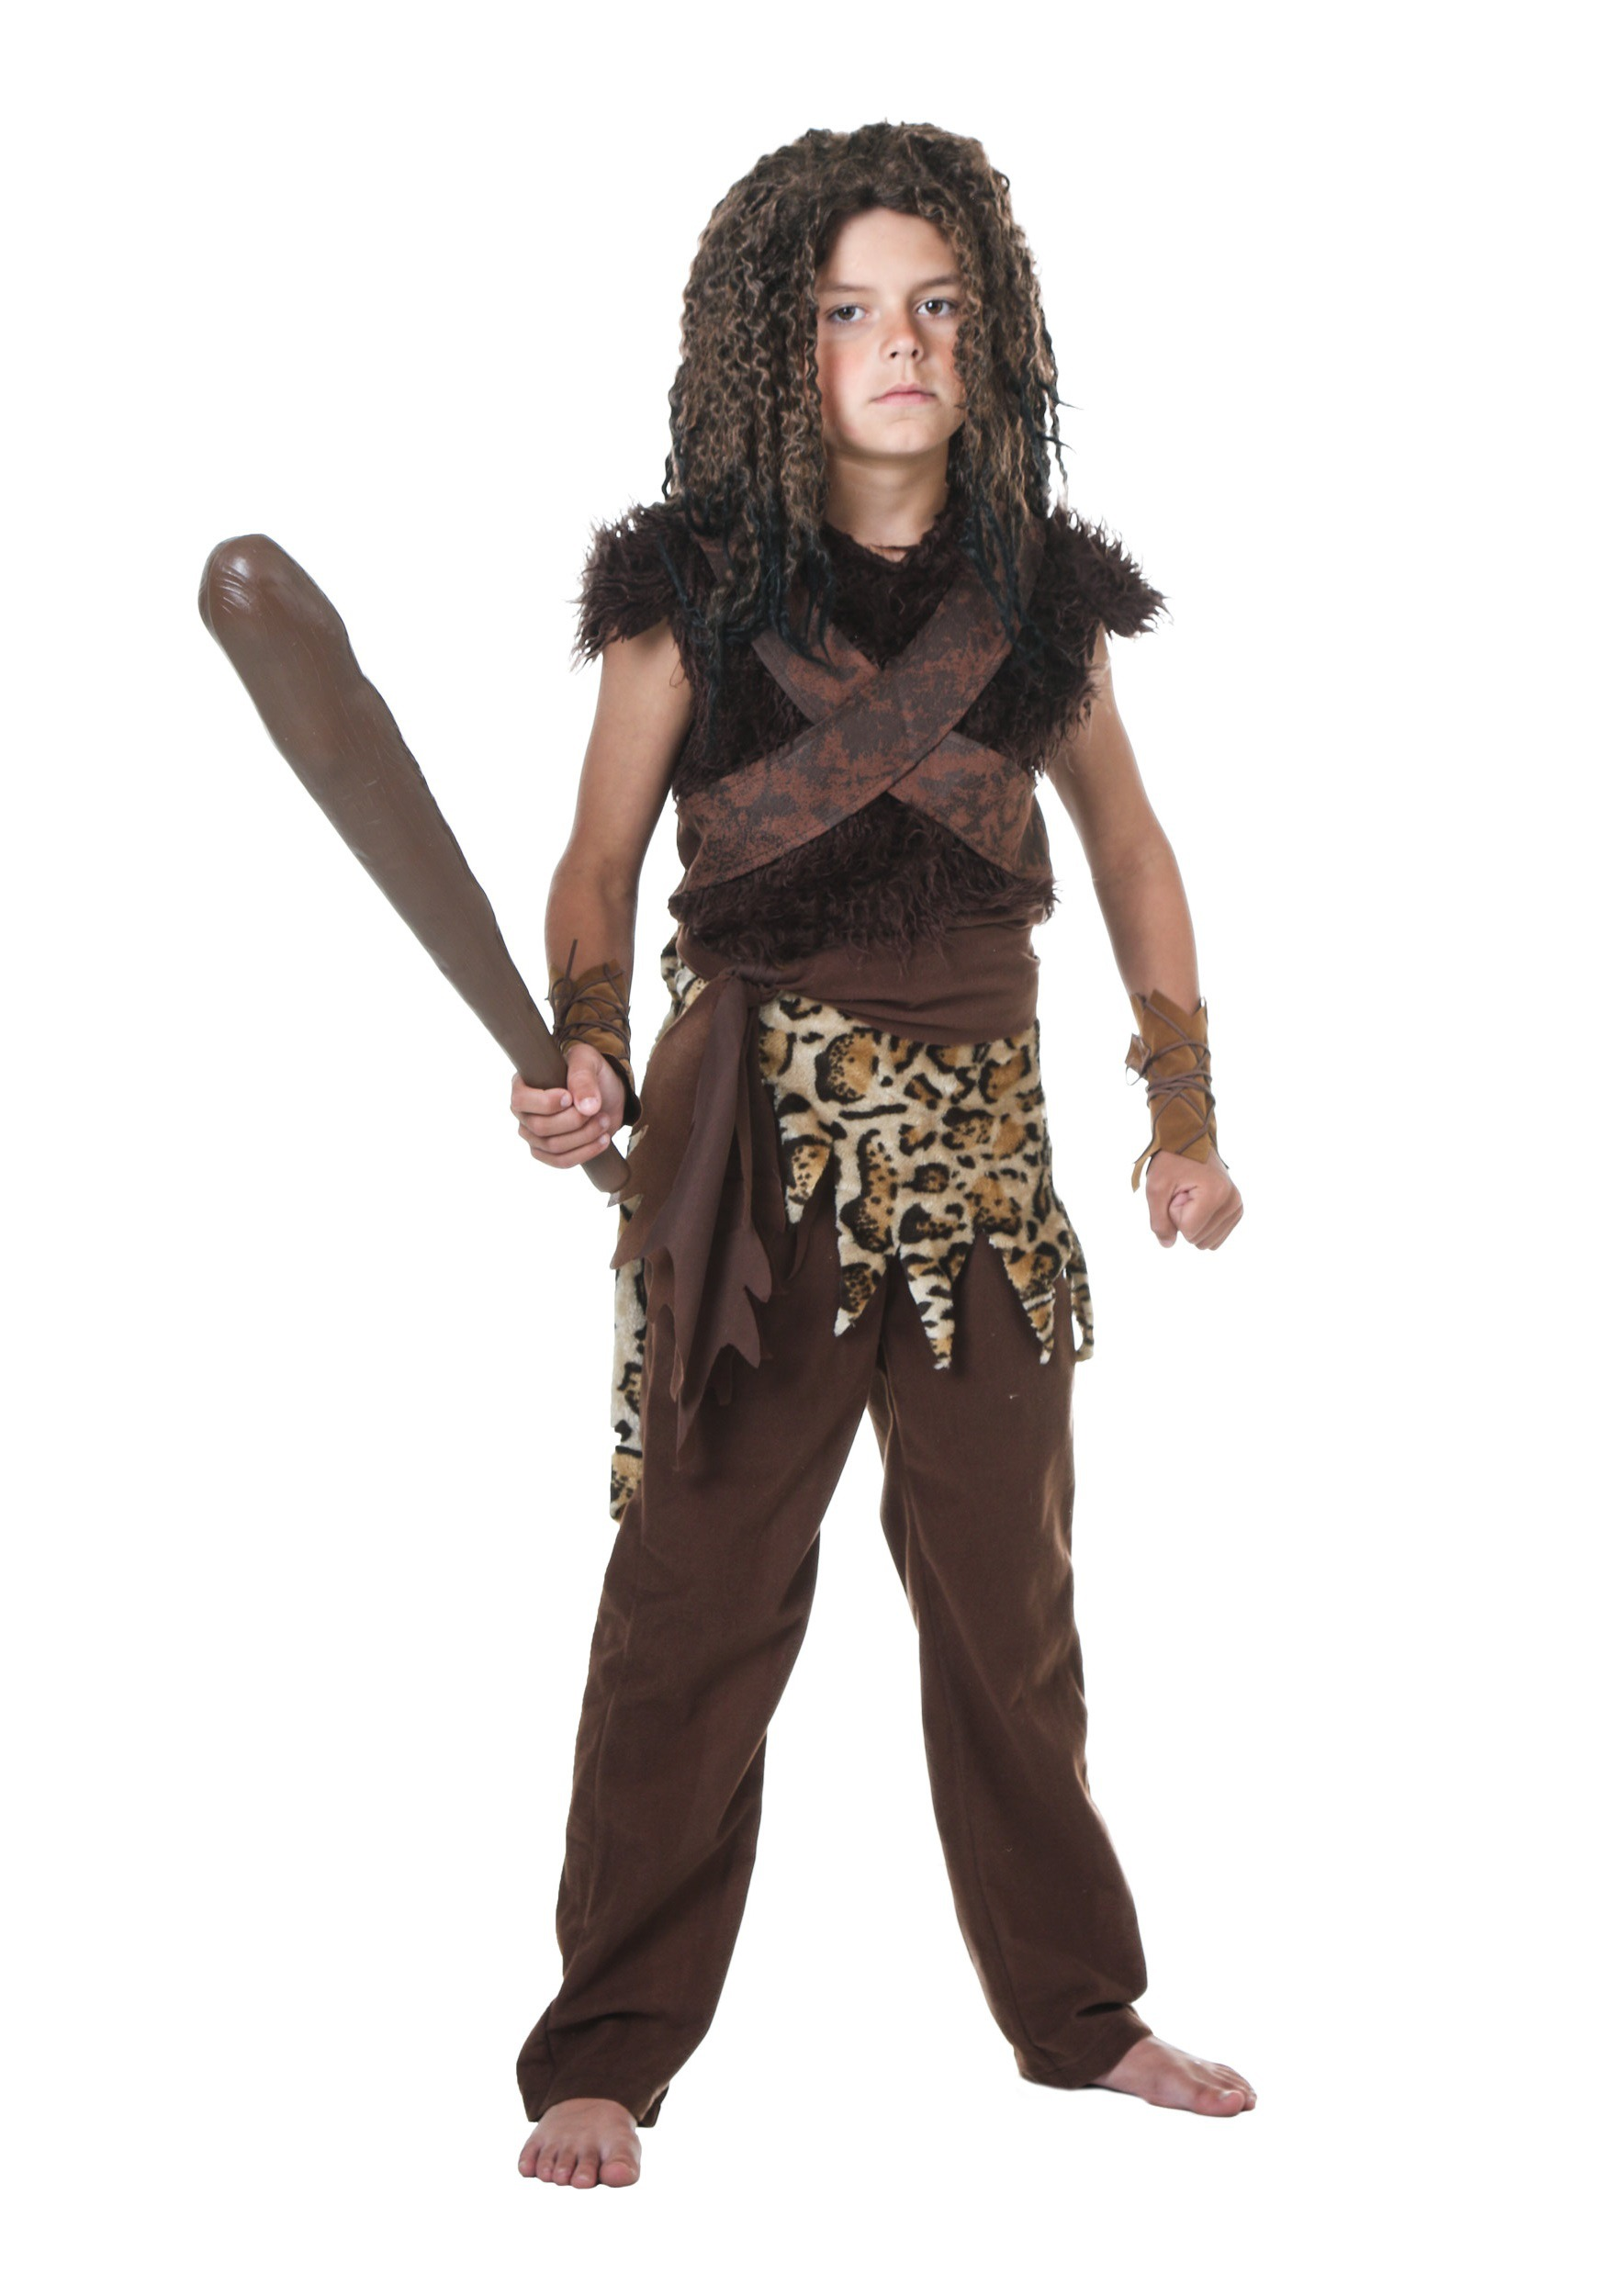 cavewoman costume diy #8